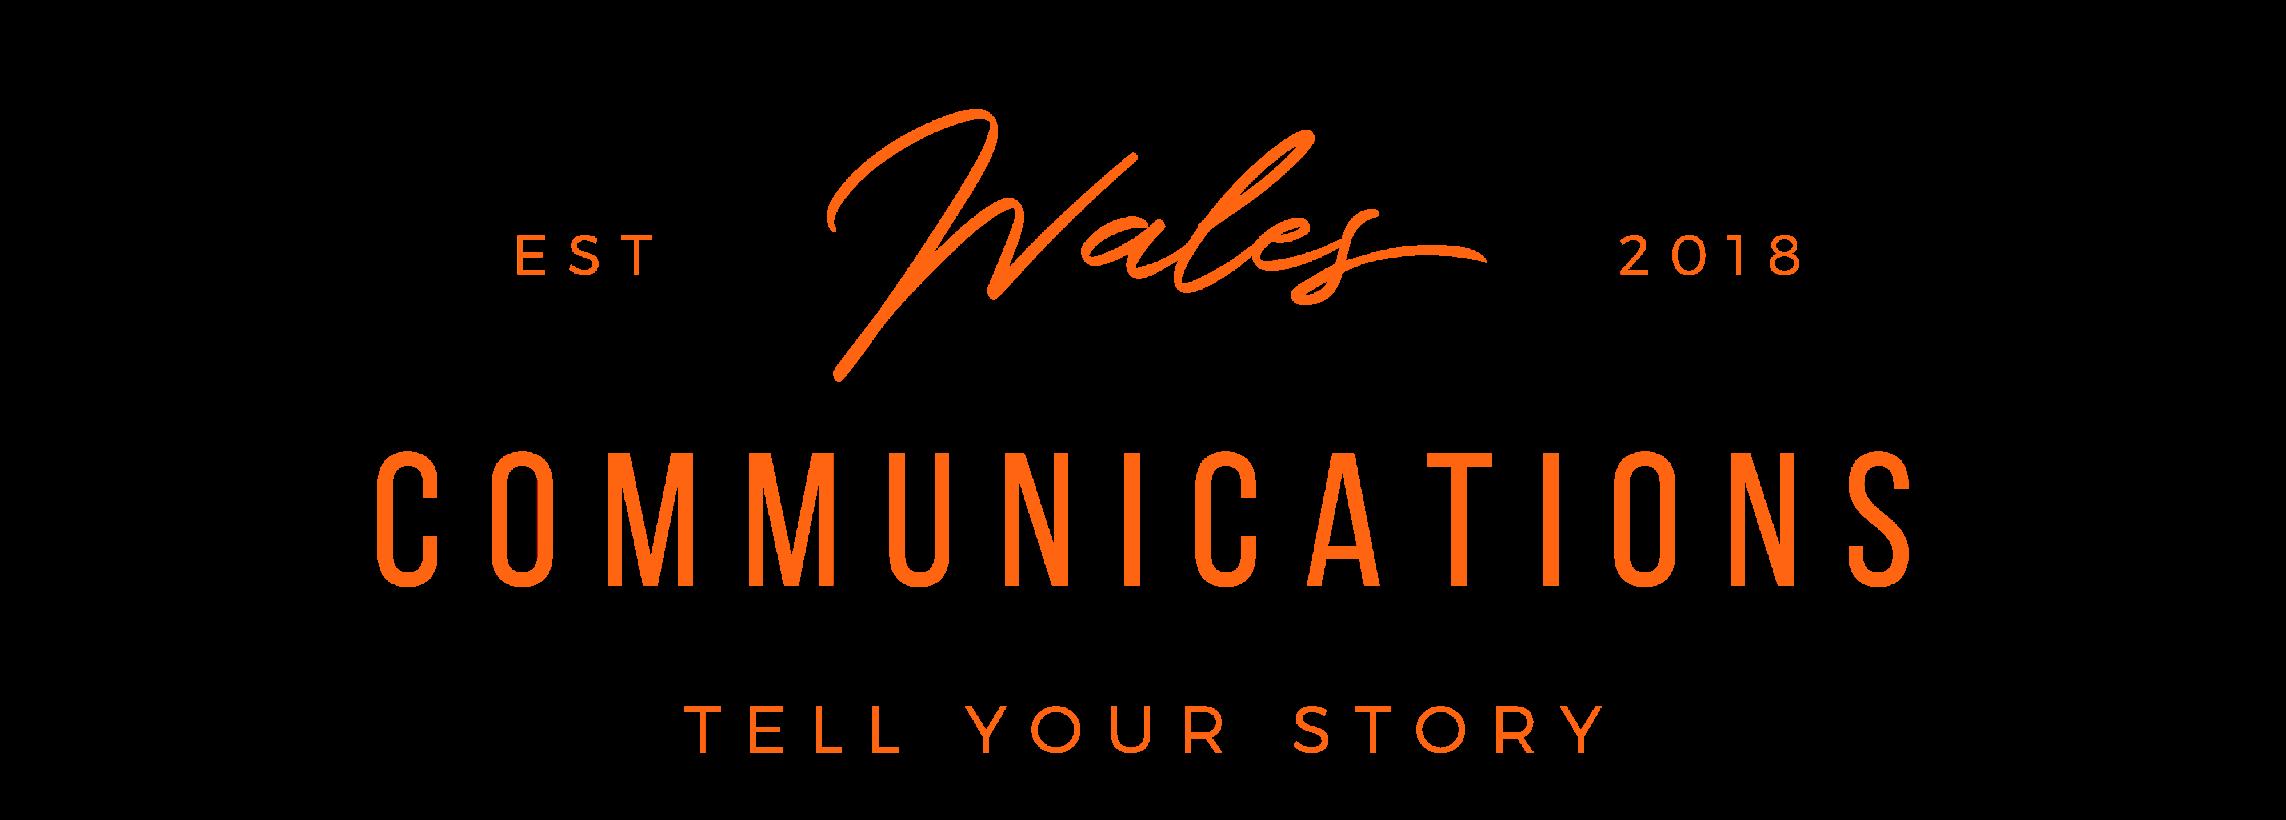 Wales Communications